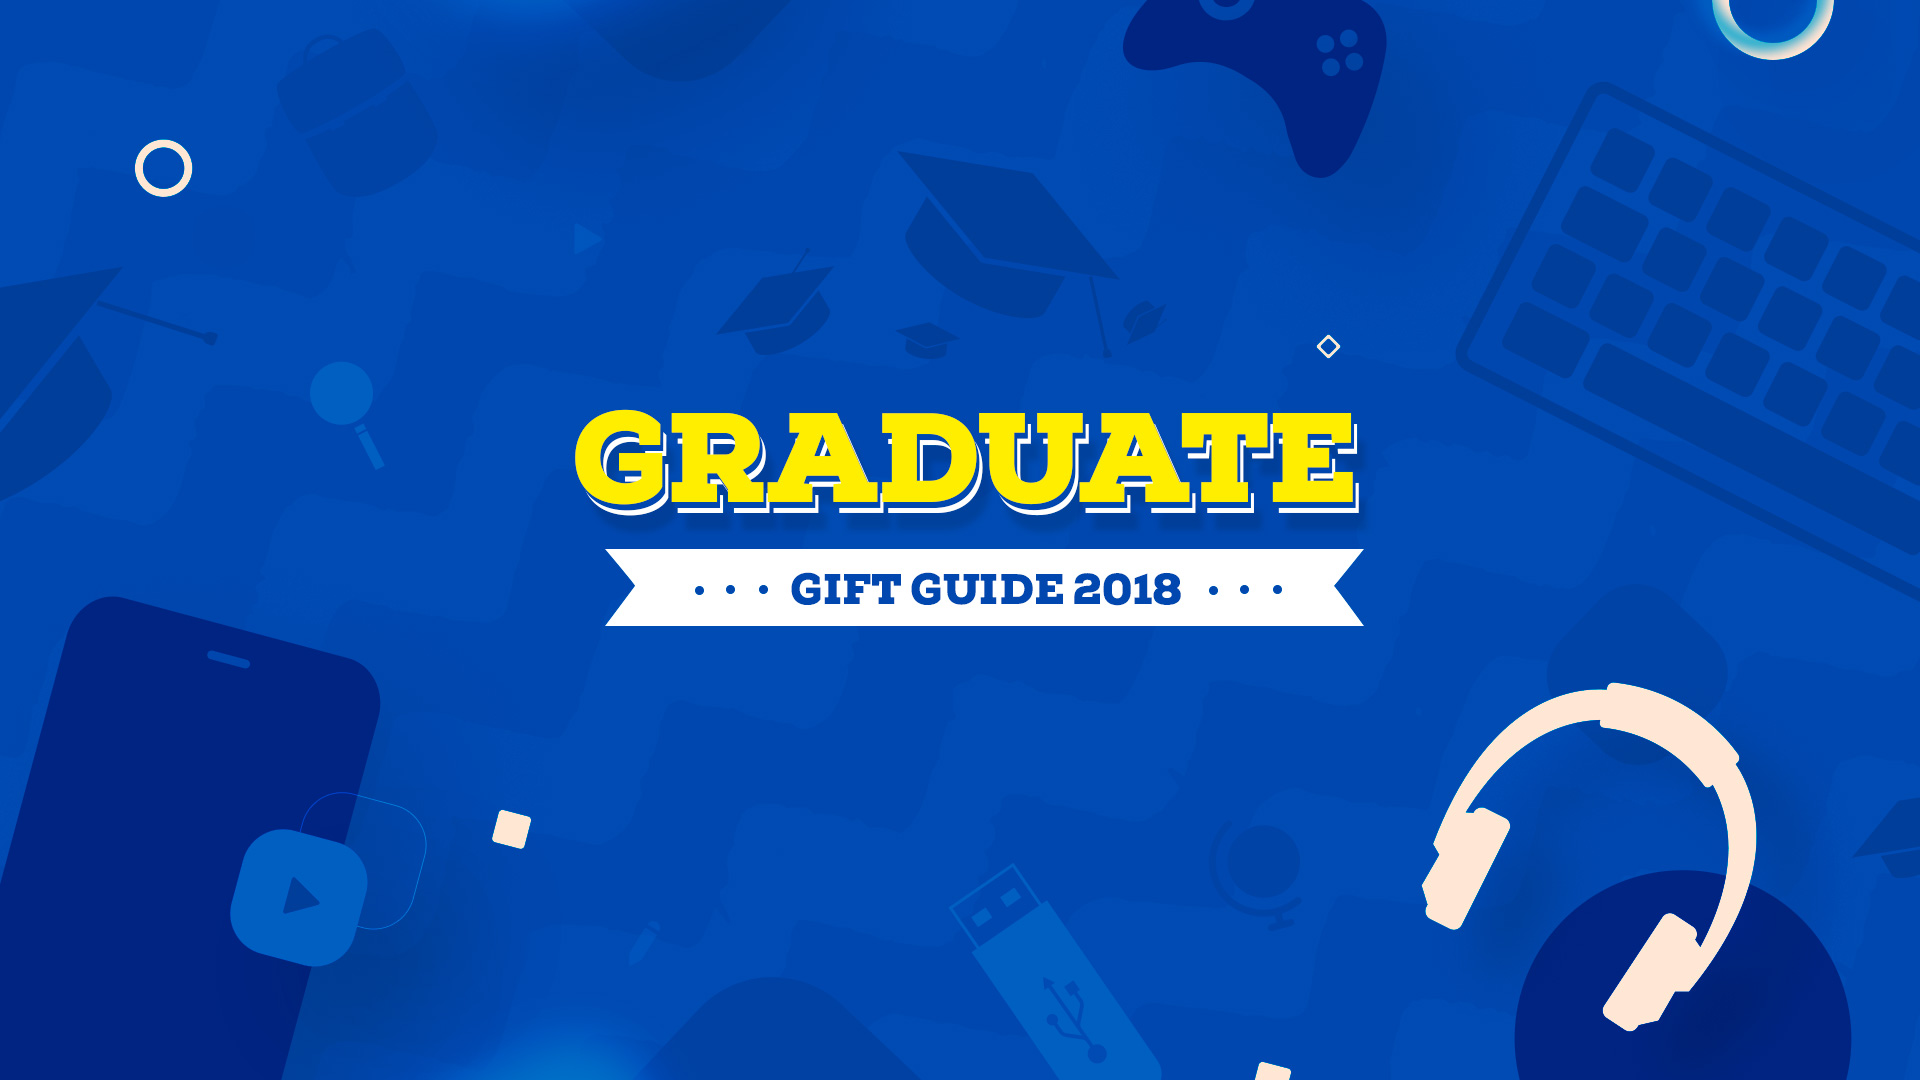 graduations-gift-guide-generic.jpg